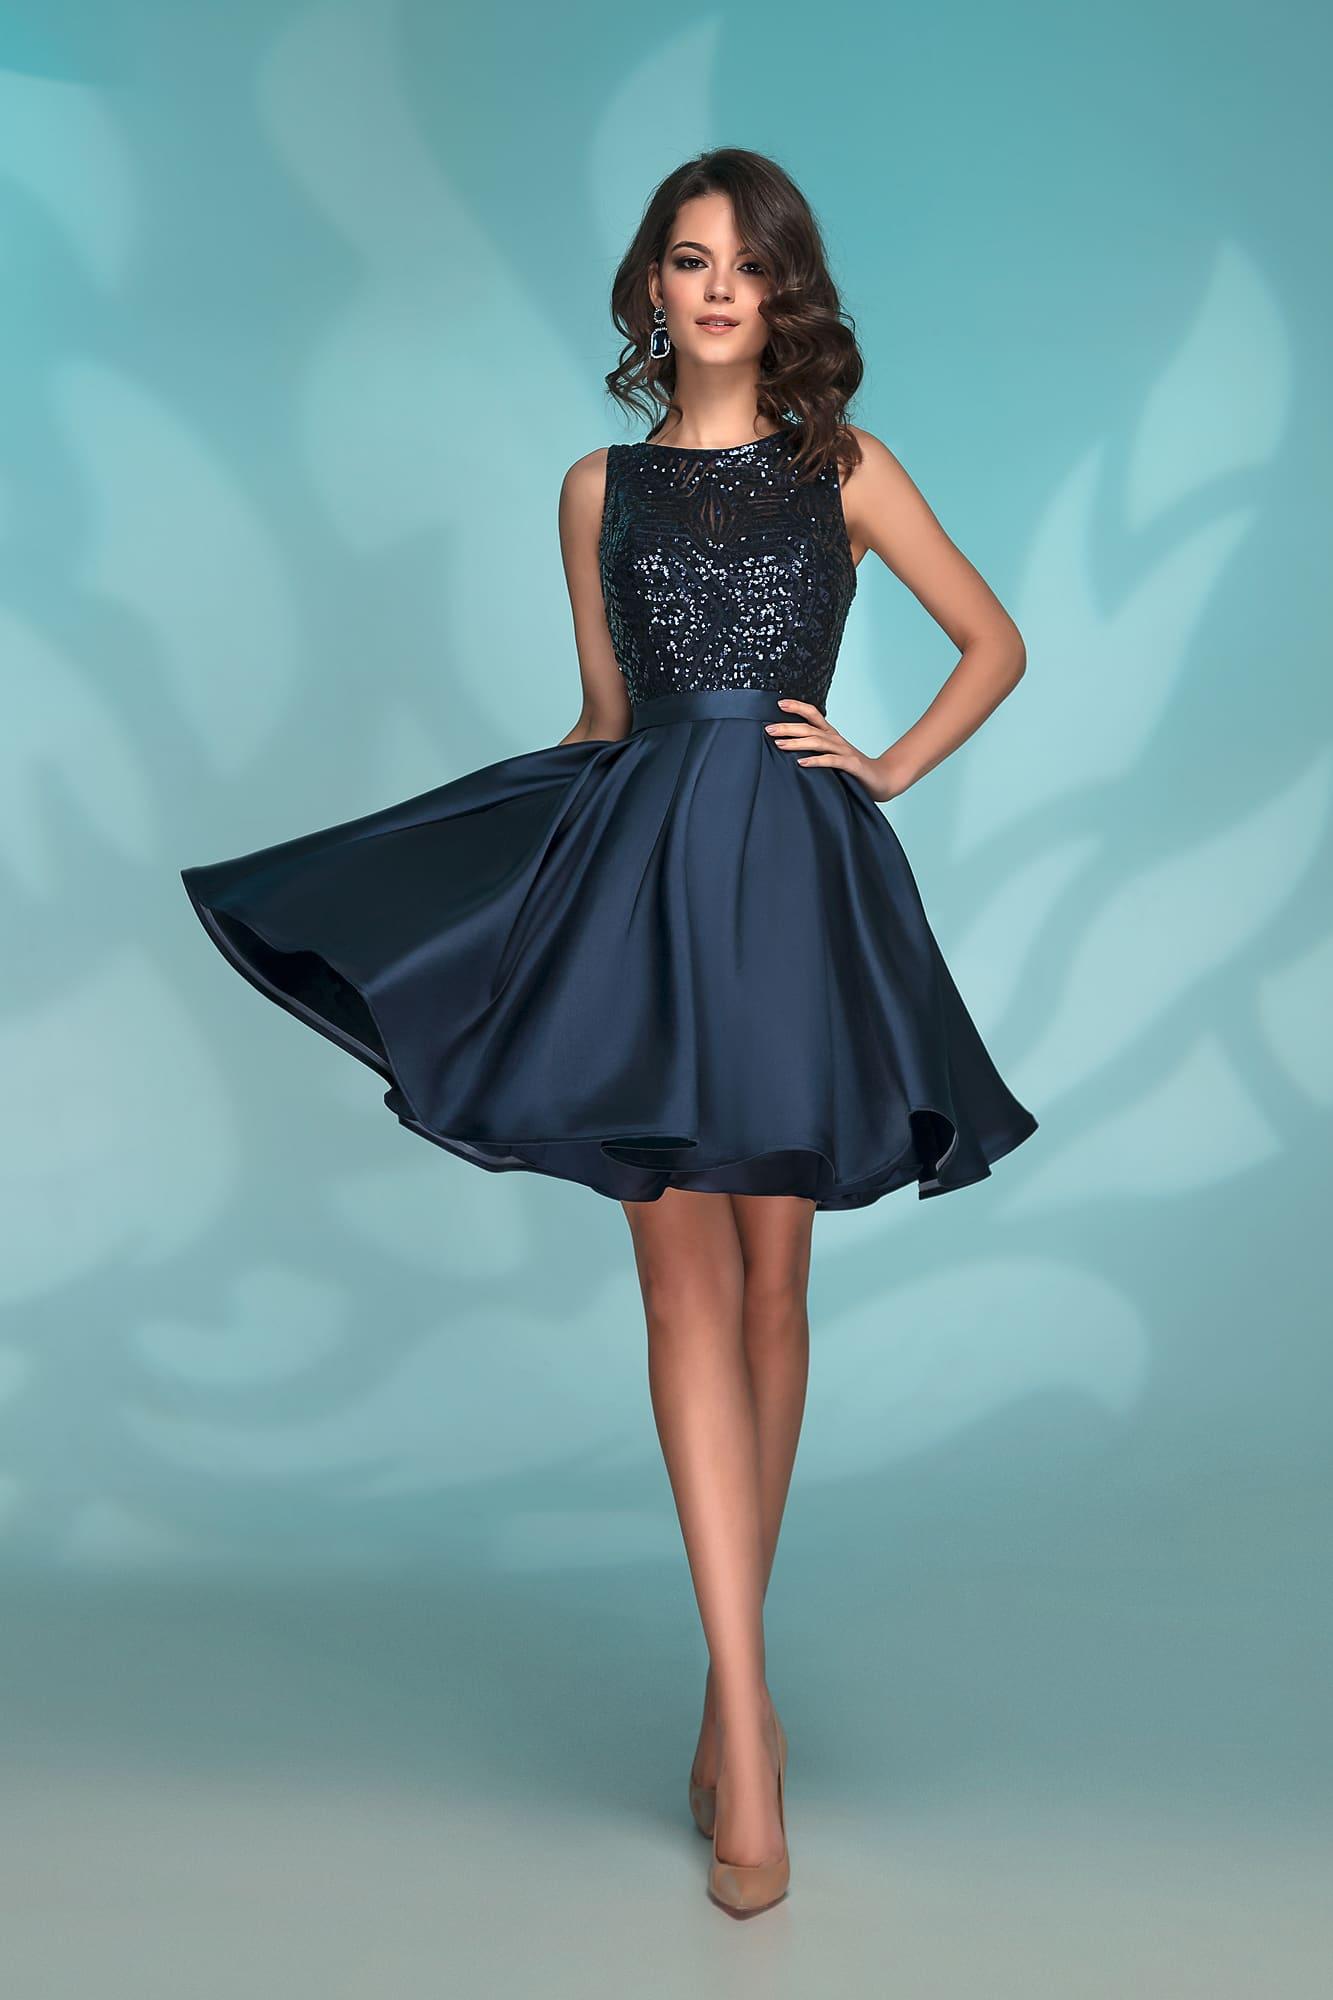 9695d985e56 Темно-синее короткое выпускное платье Nora Naviano 72034 navy ...